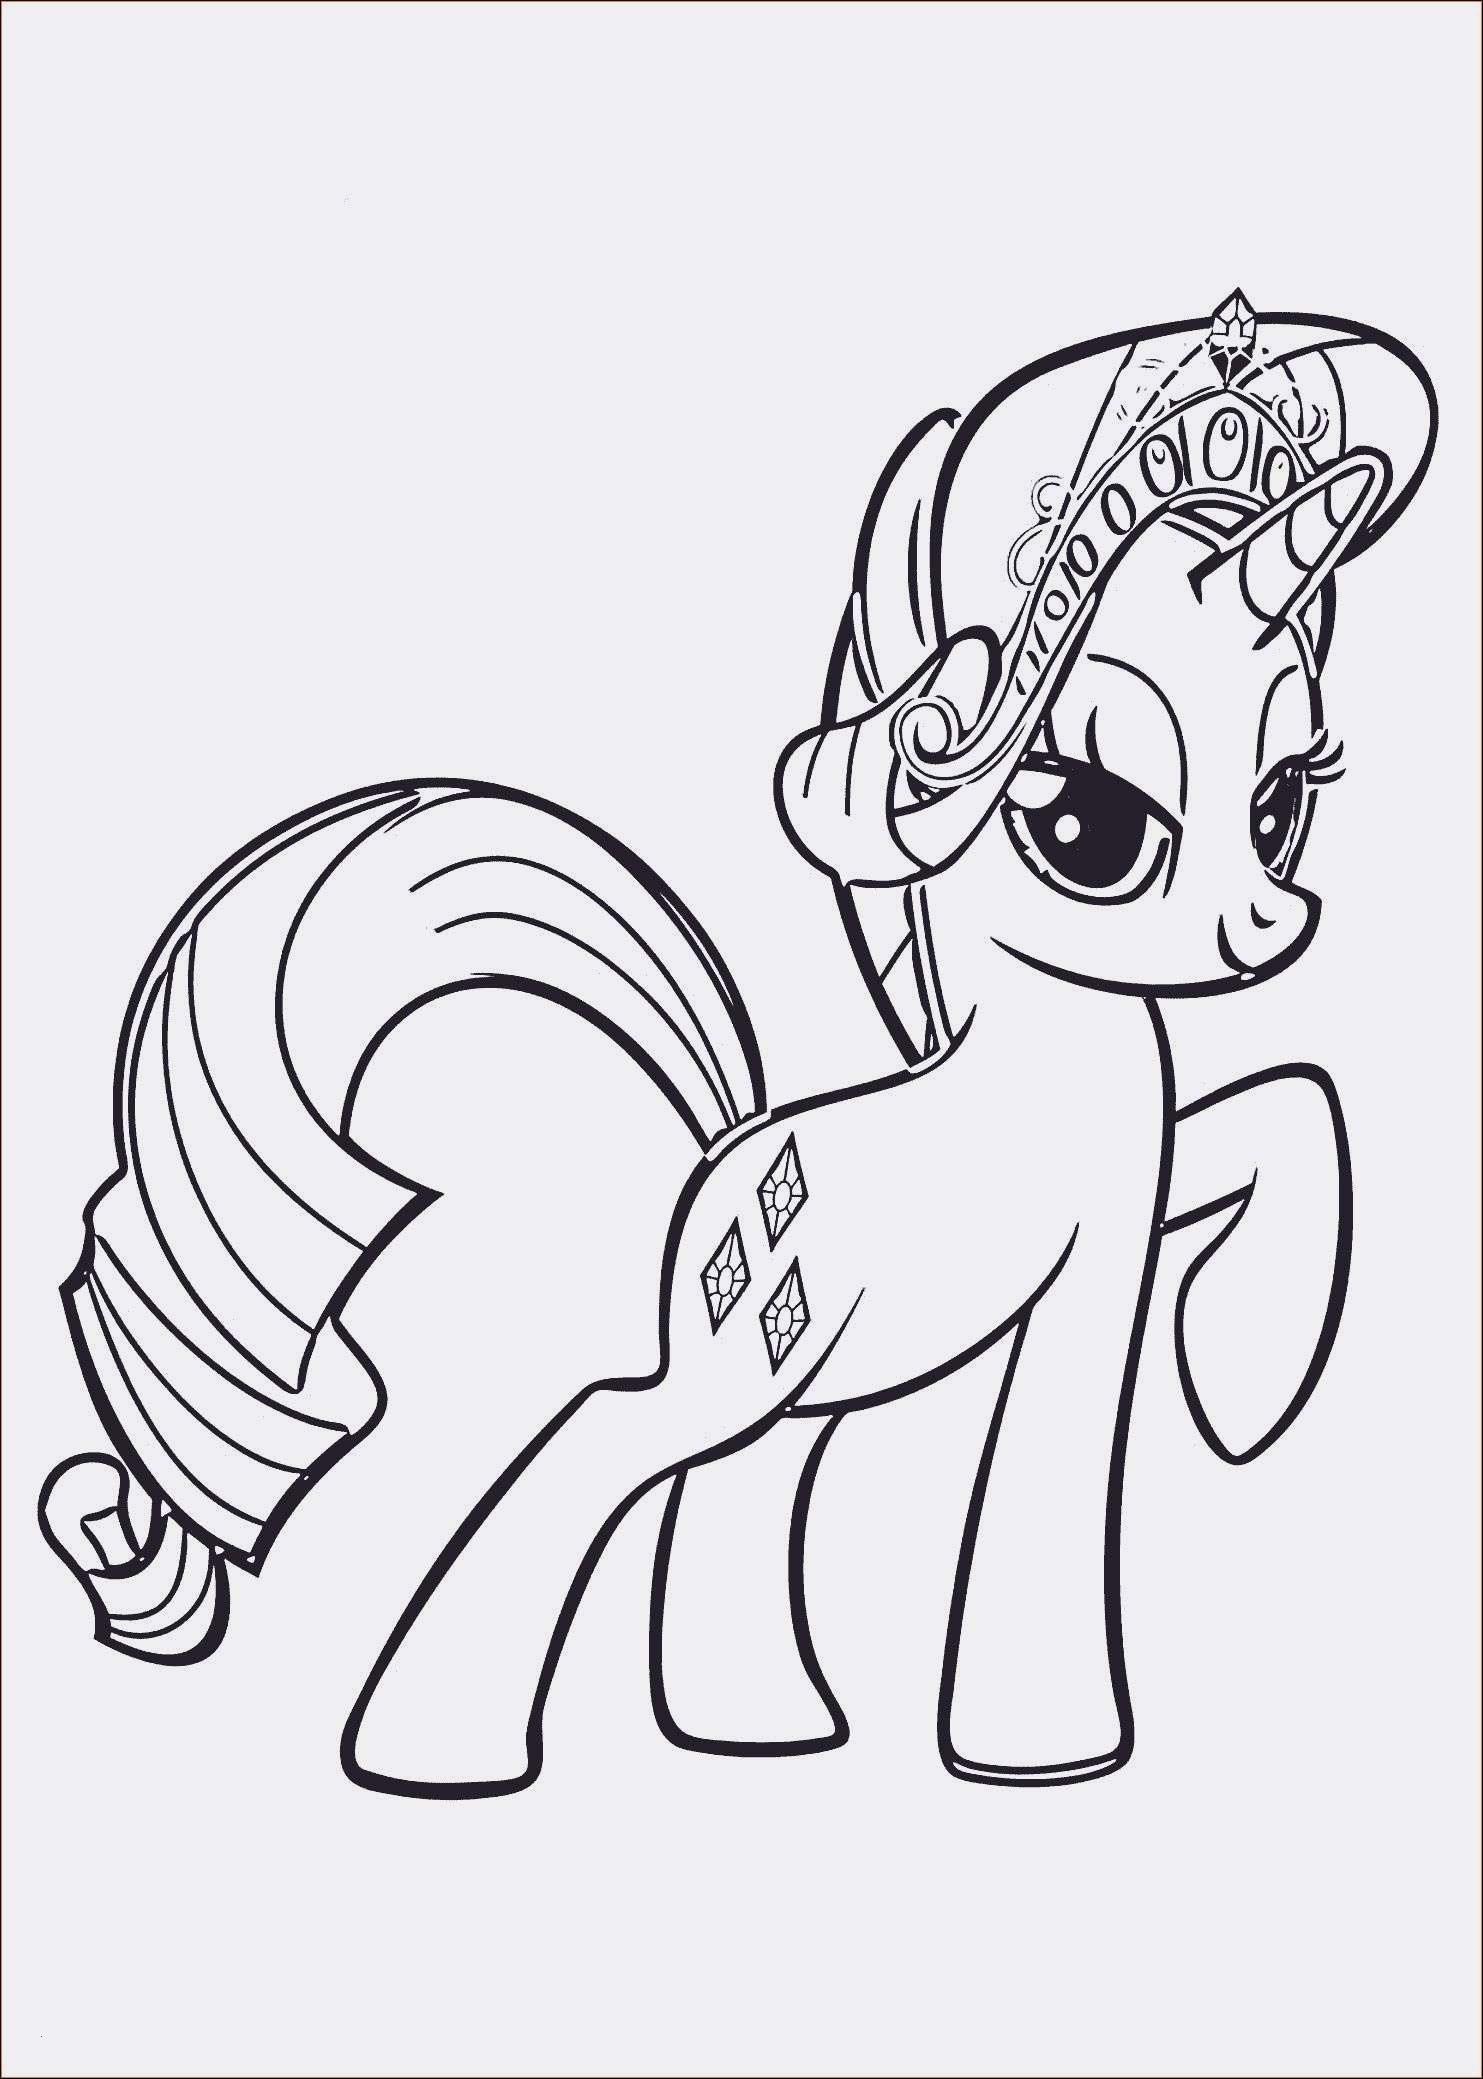 Ausmalbild My Little Pony Einzigartig Ausmalbilder My Little Pony Zum Drucken Neu 37 My Little Pony Pinkie Stock